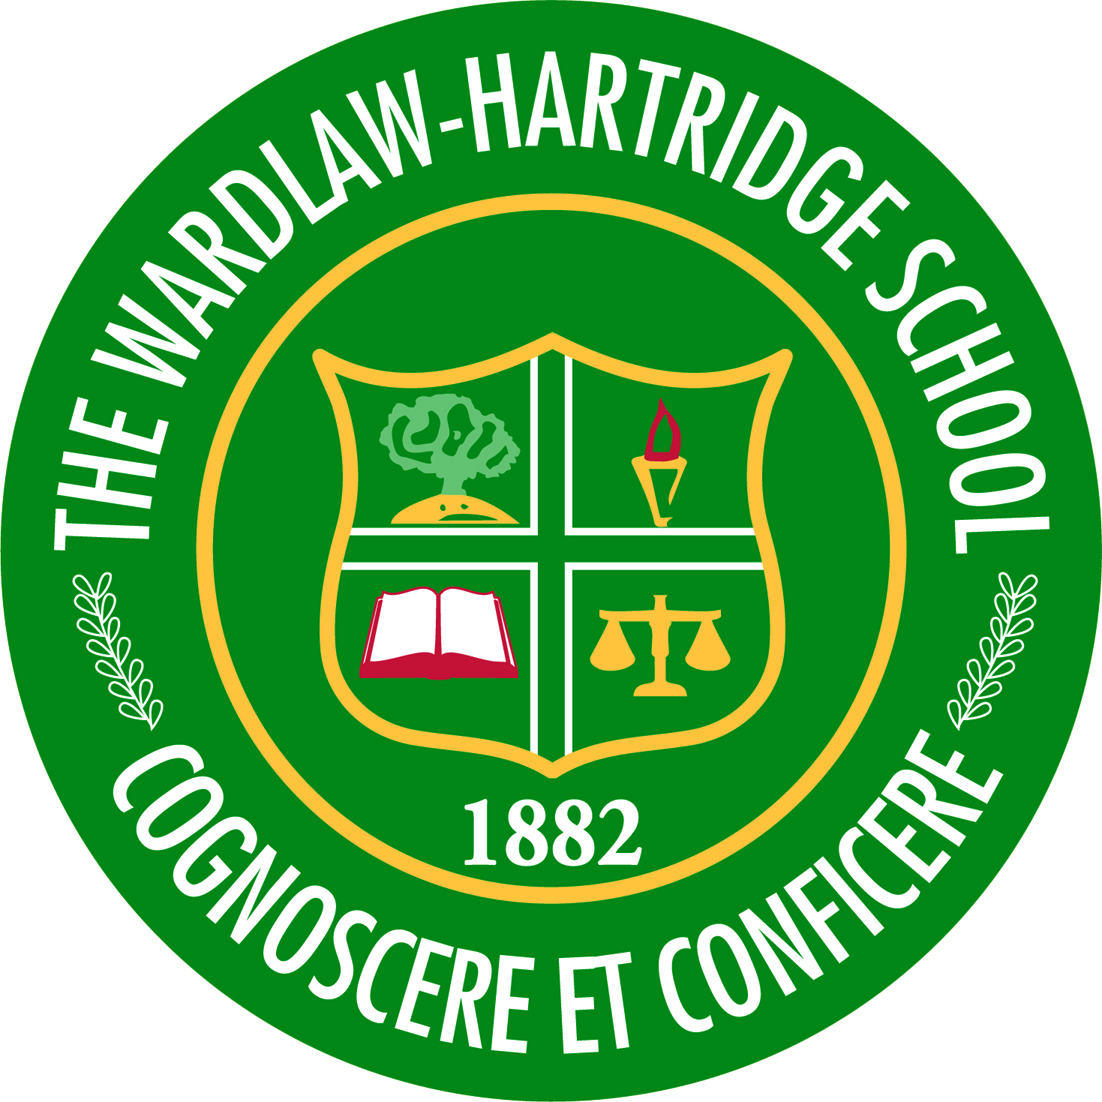 1cbbb3e0852e78d2a2cc_Wardlaw_Hartridge_logo.jpg